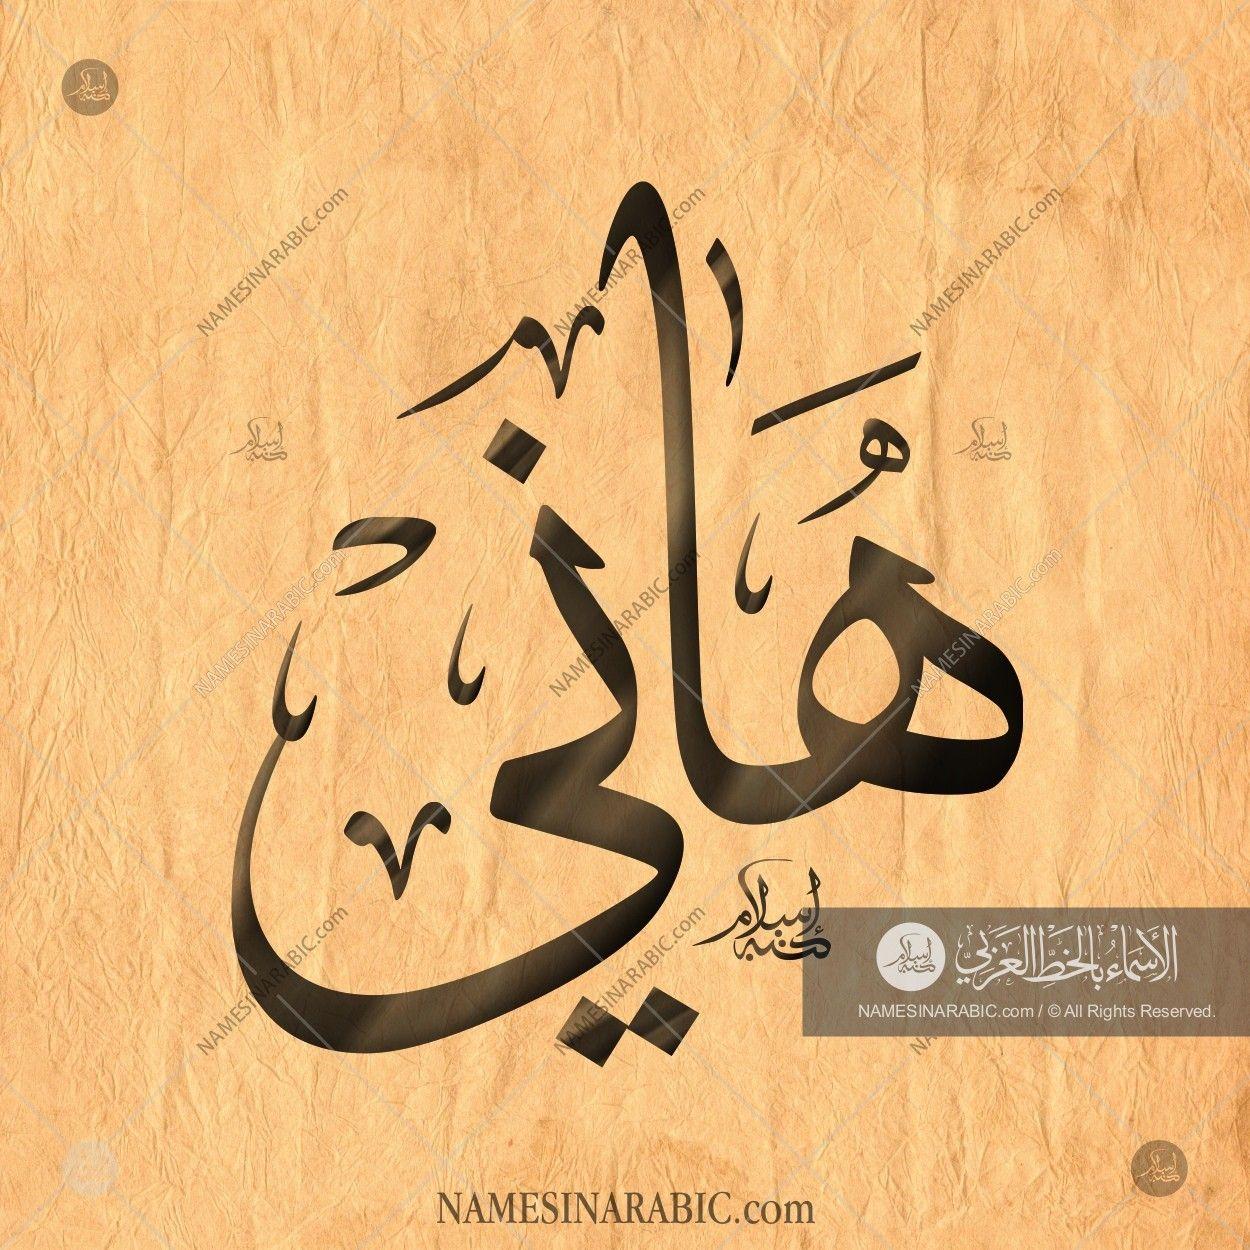 Hani هاني Names In Arabic Calligraphy Name 1871 Calligraphy Words Calligraphy Name Arabic Calligraphy Design